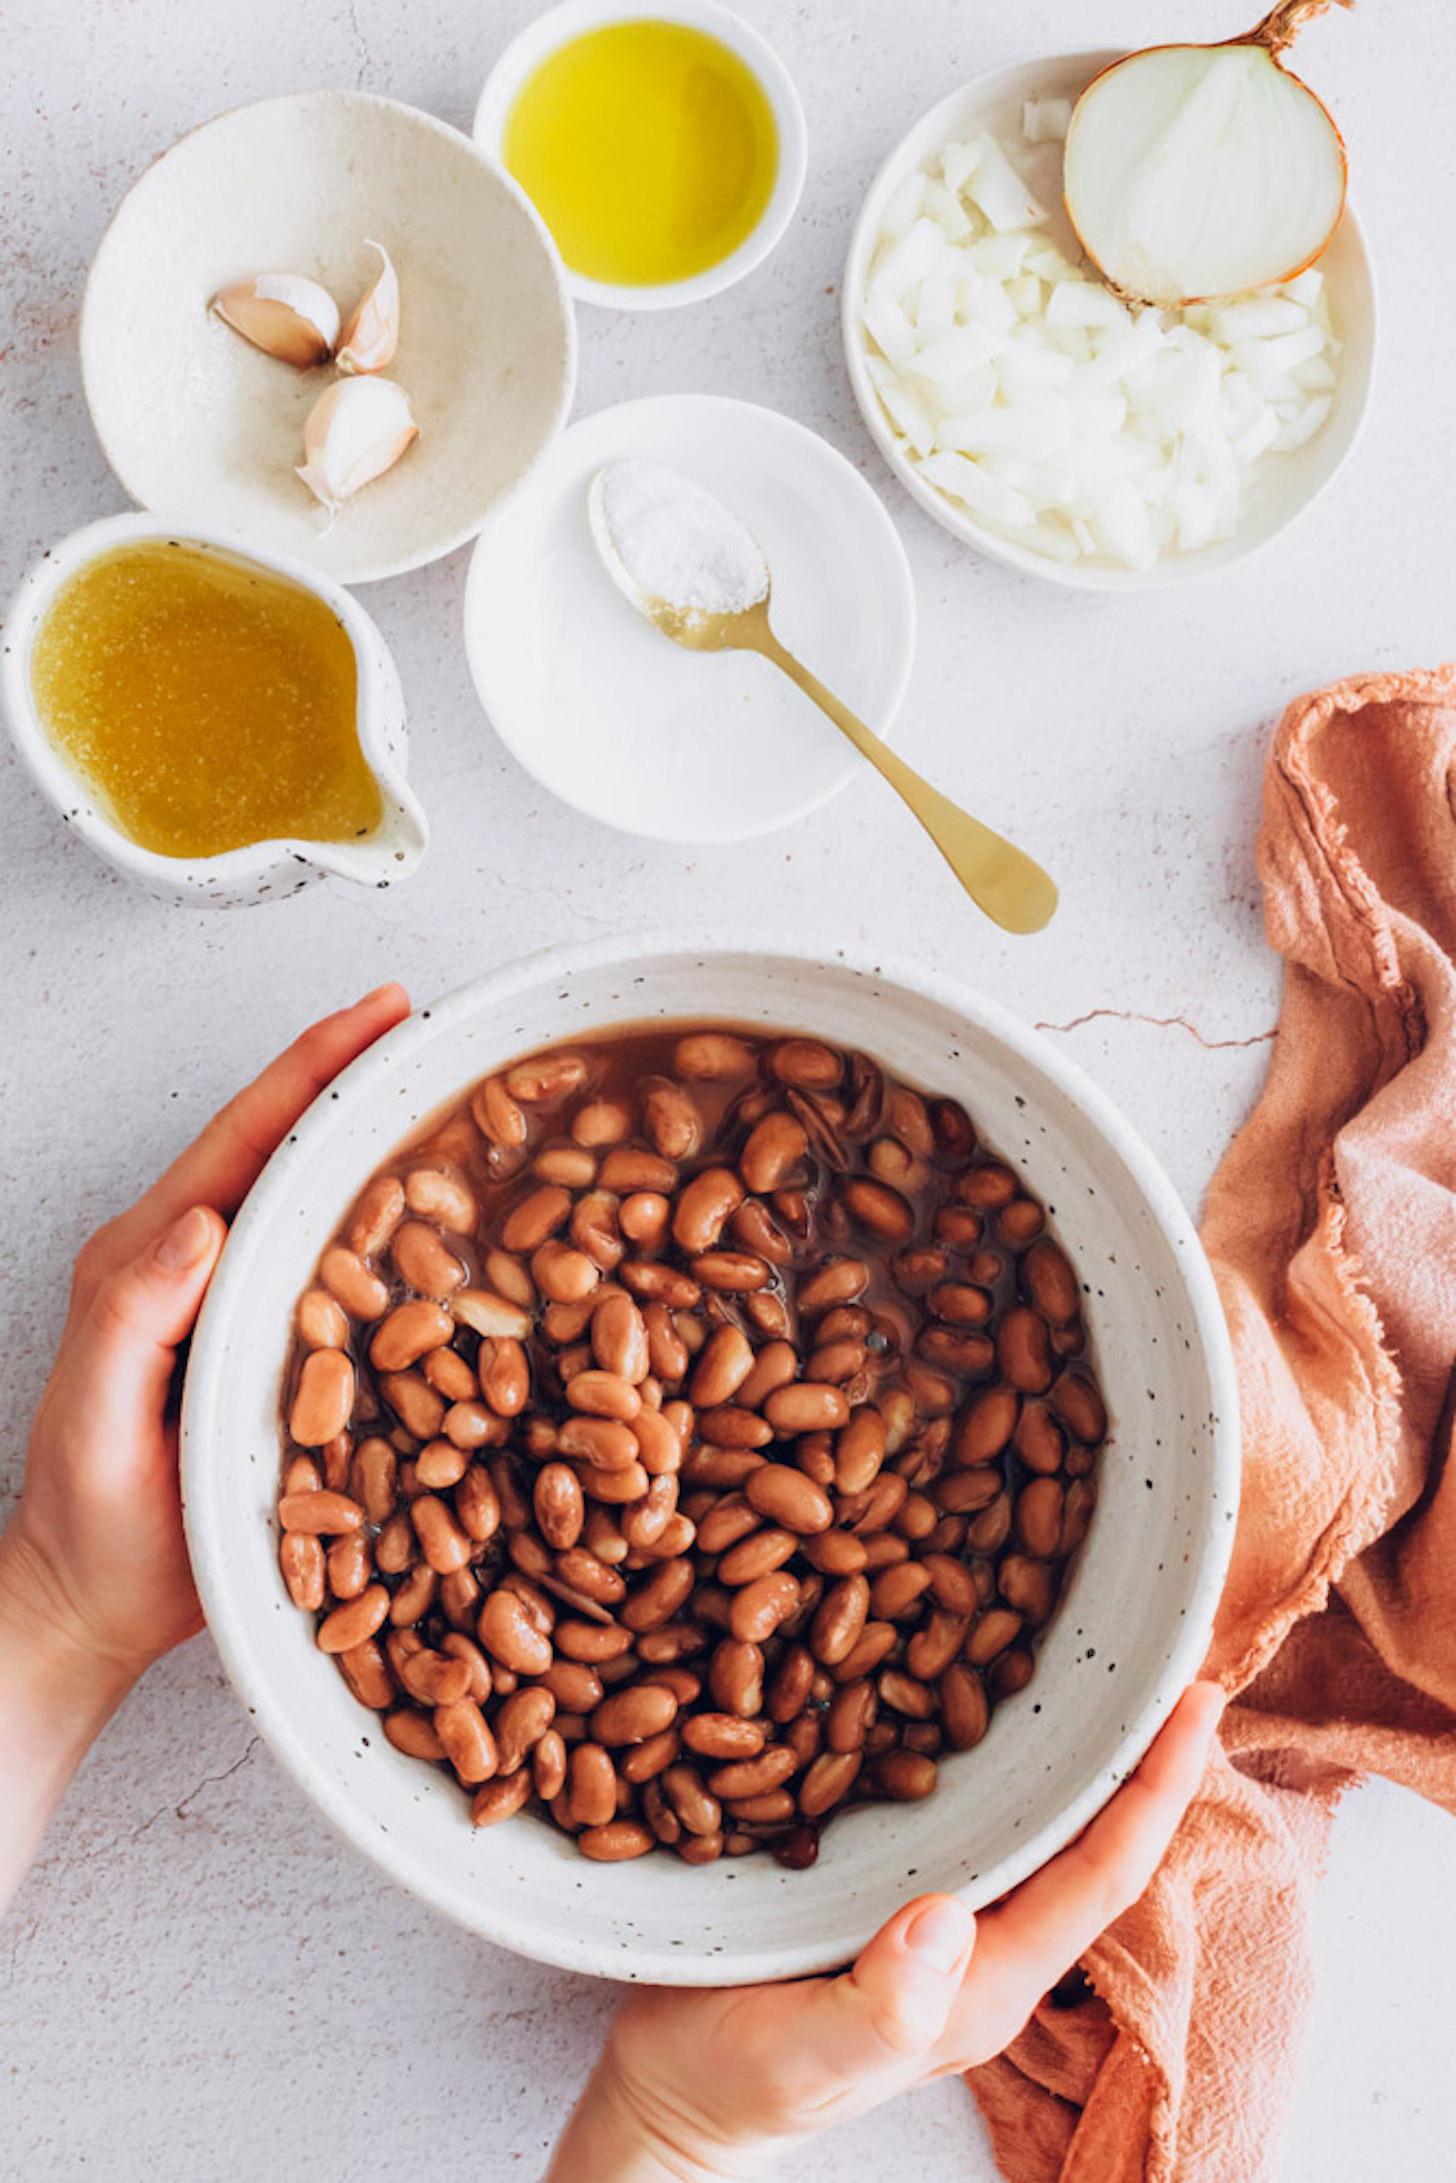 Pinto beans, garlic, onion, salt, vegetable broth, and avocado oil